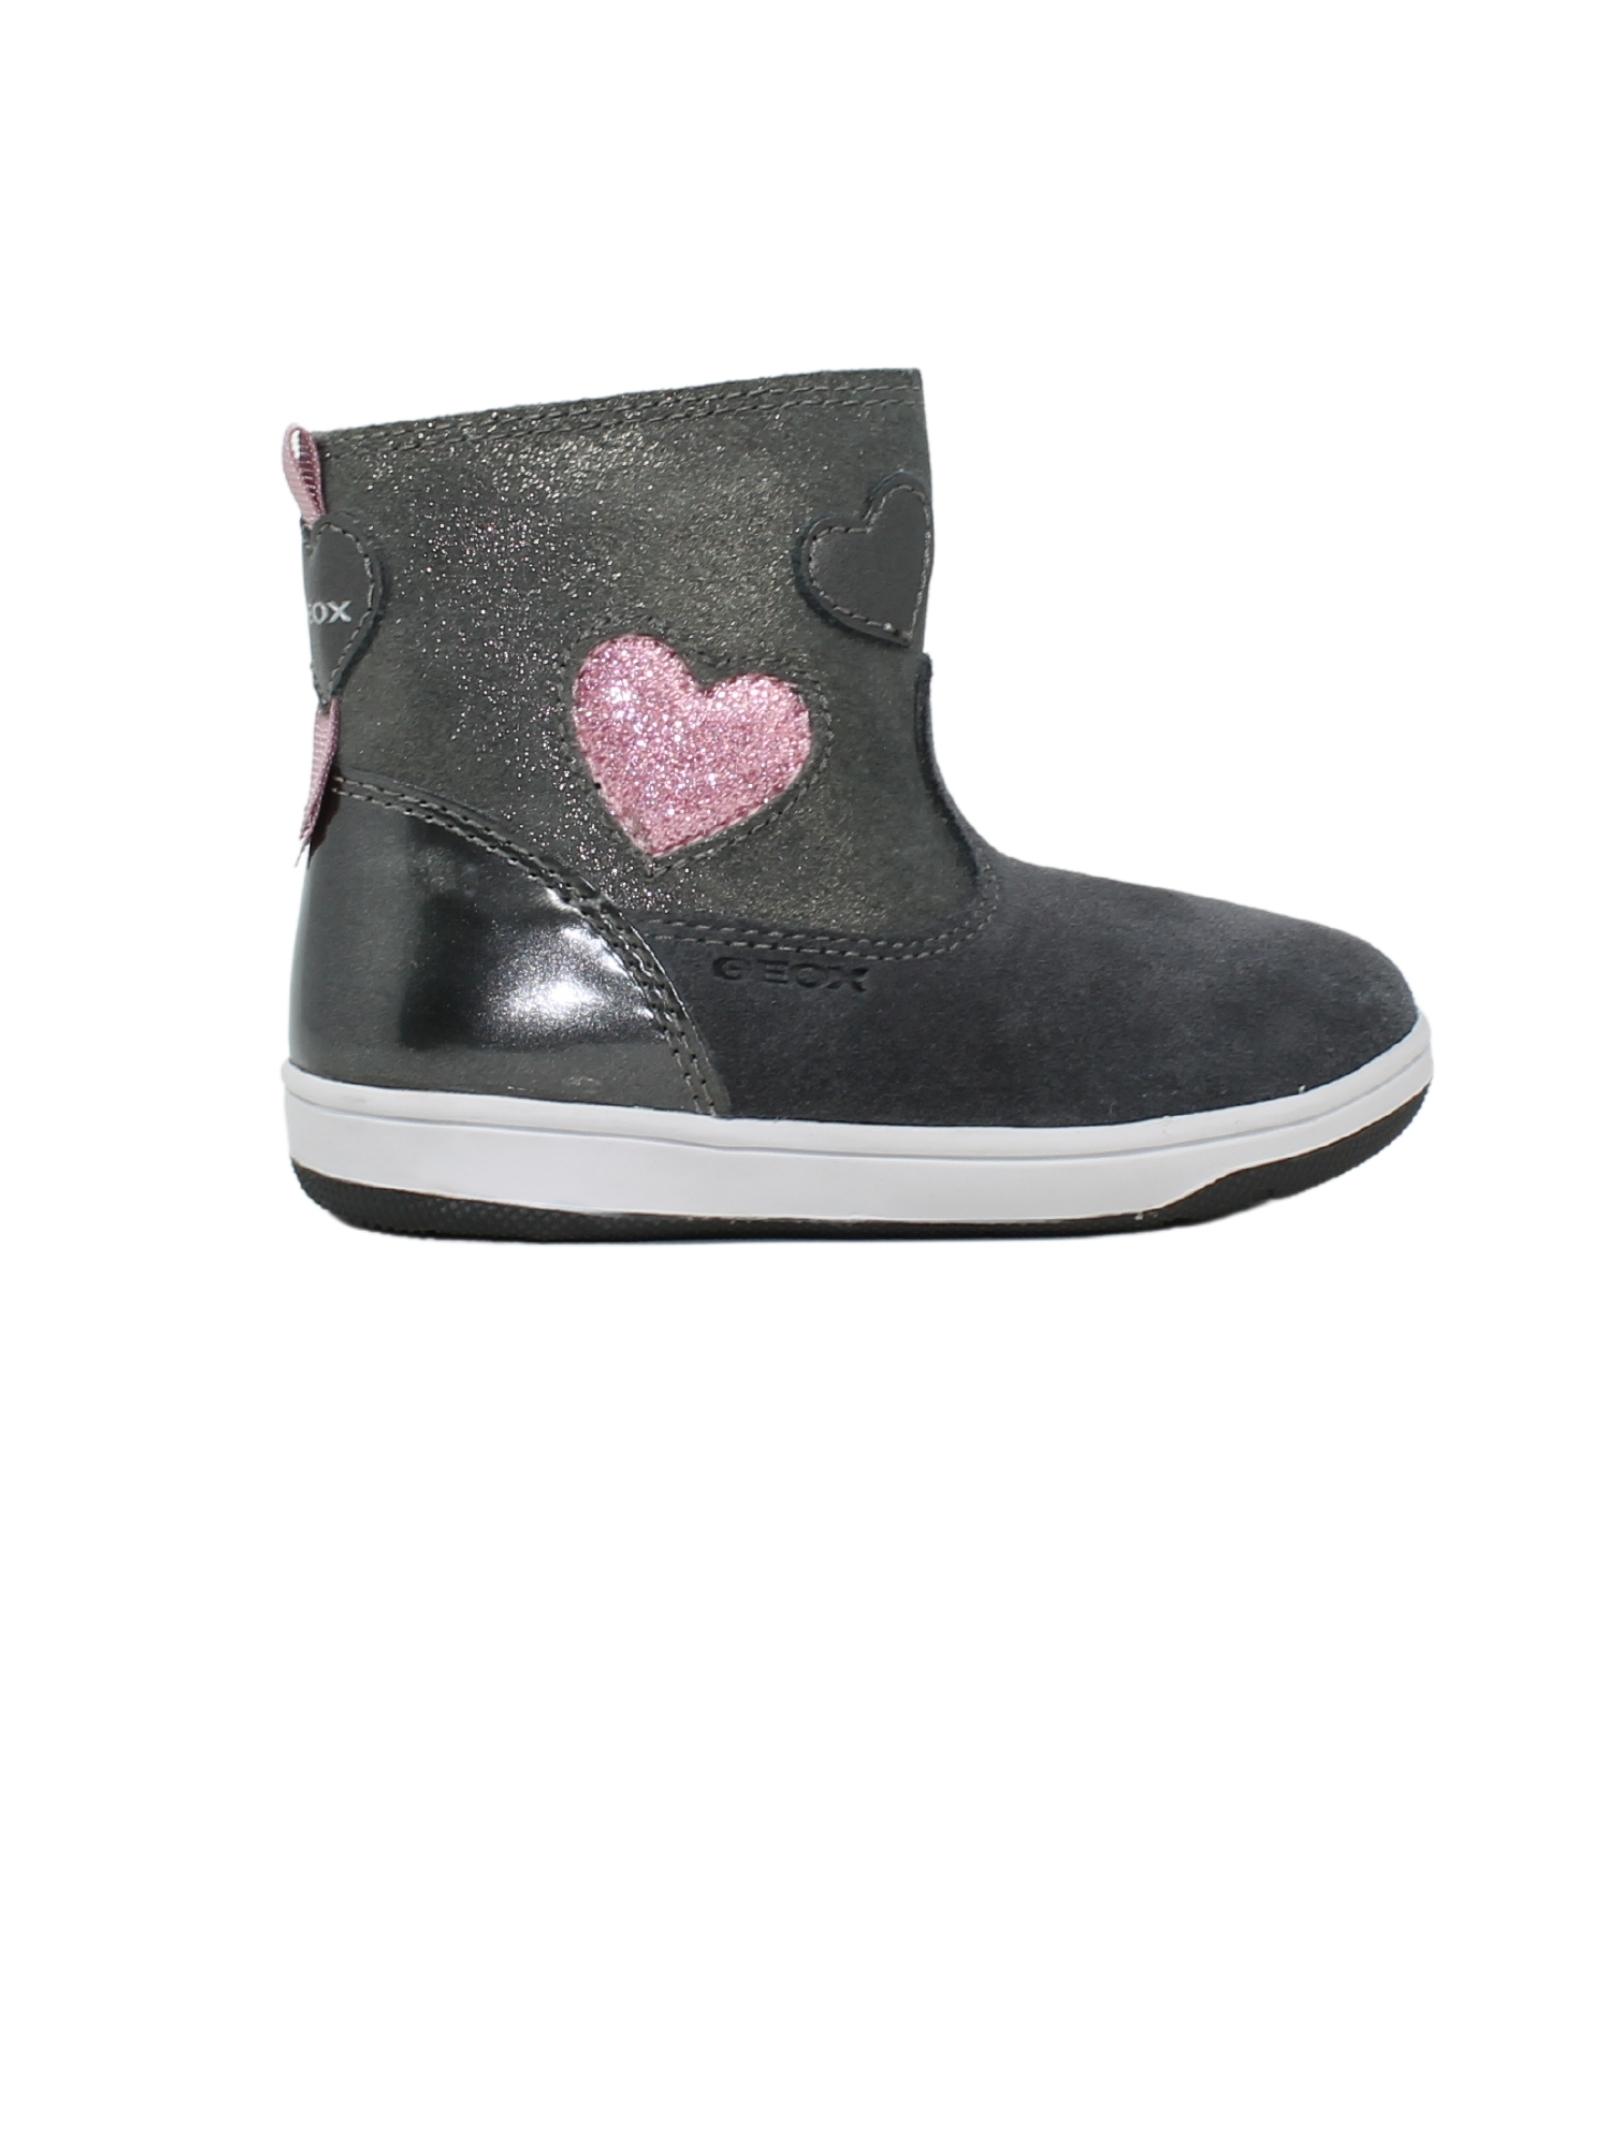 Heart Girls boots GEOX KIDS   Boots   B161HA02277C9002